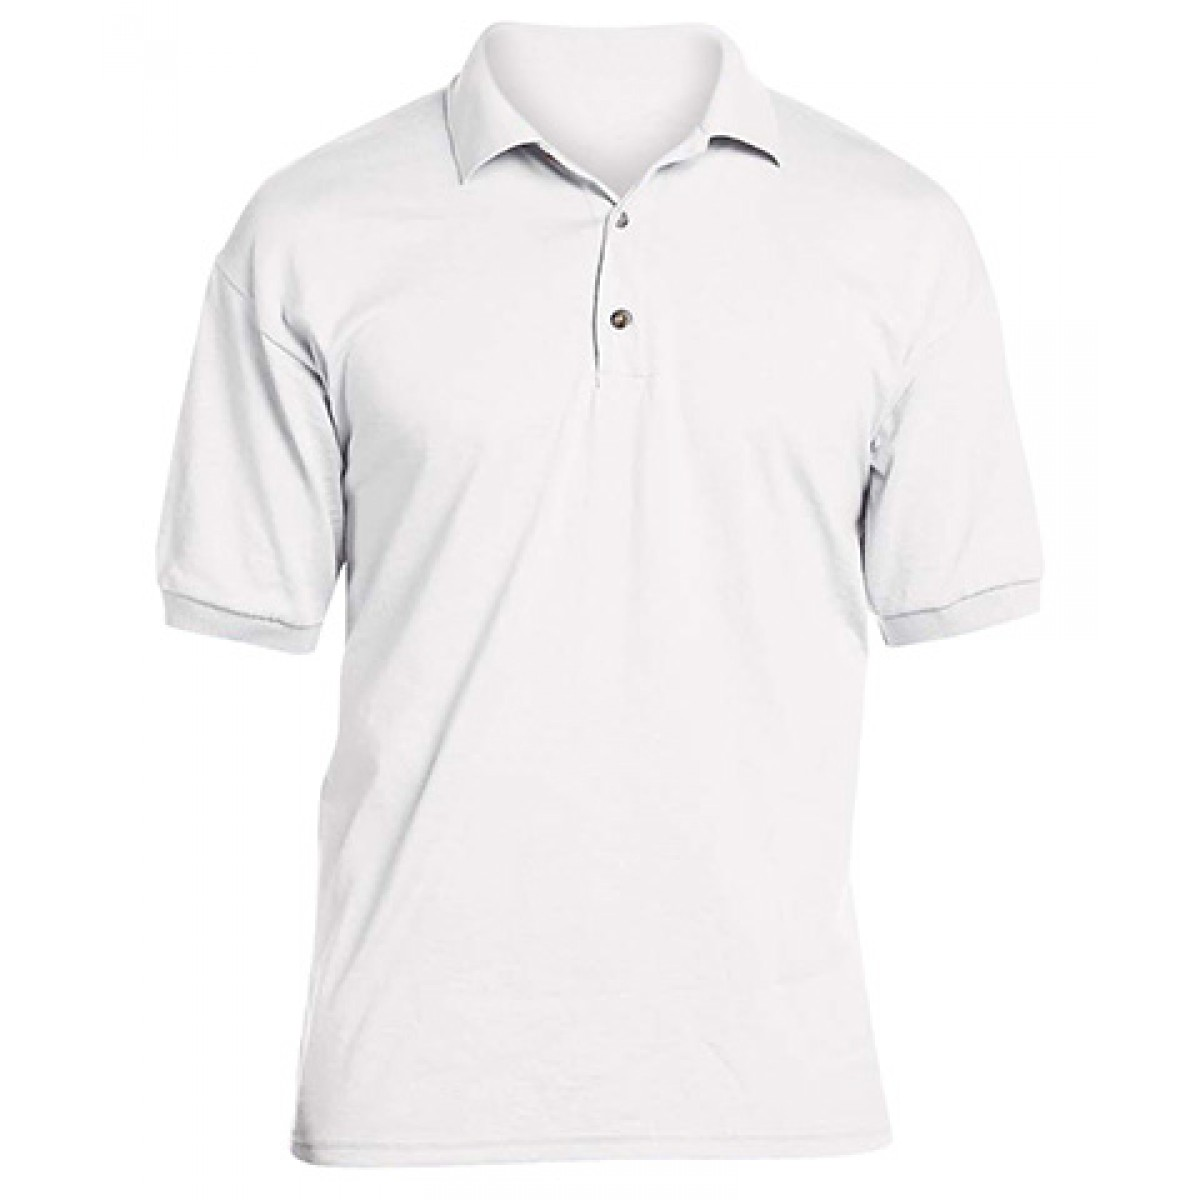 Jersey Polo 50/50 -White-M